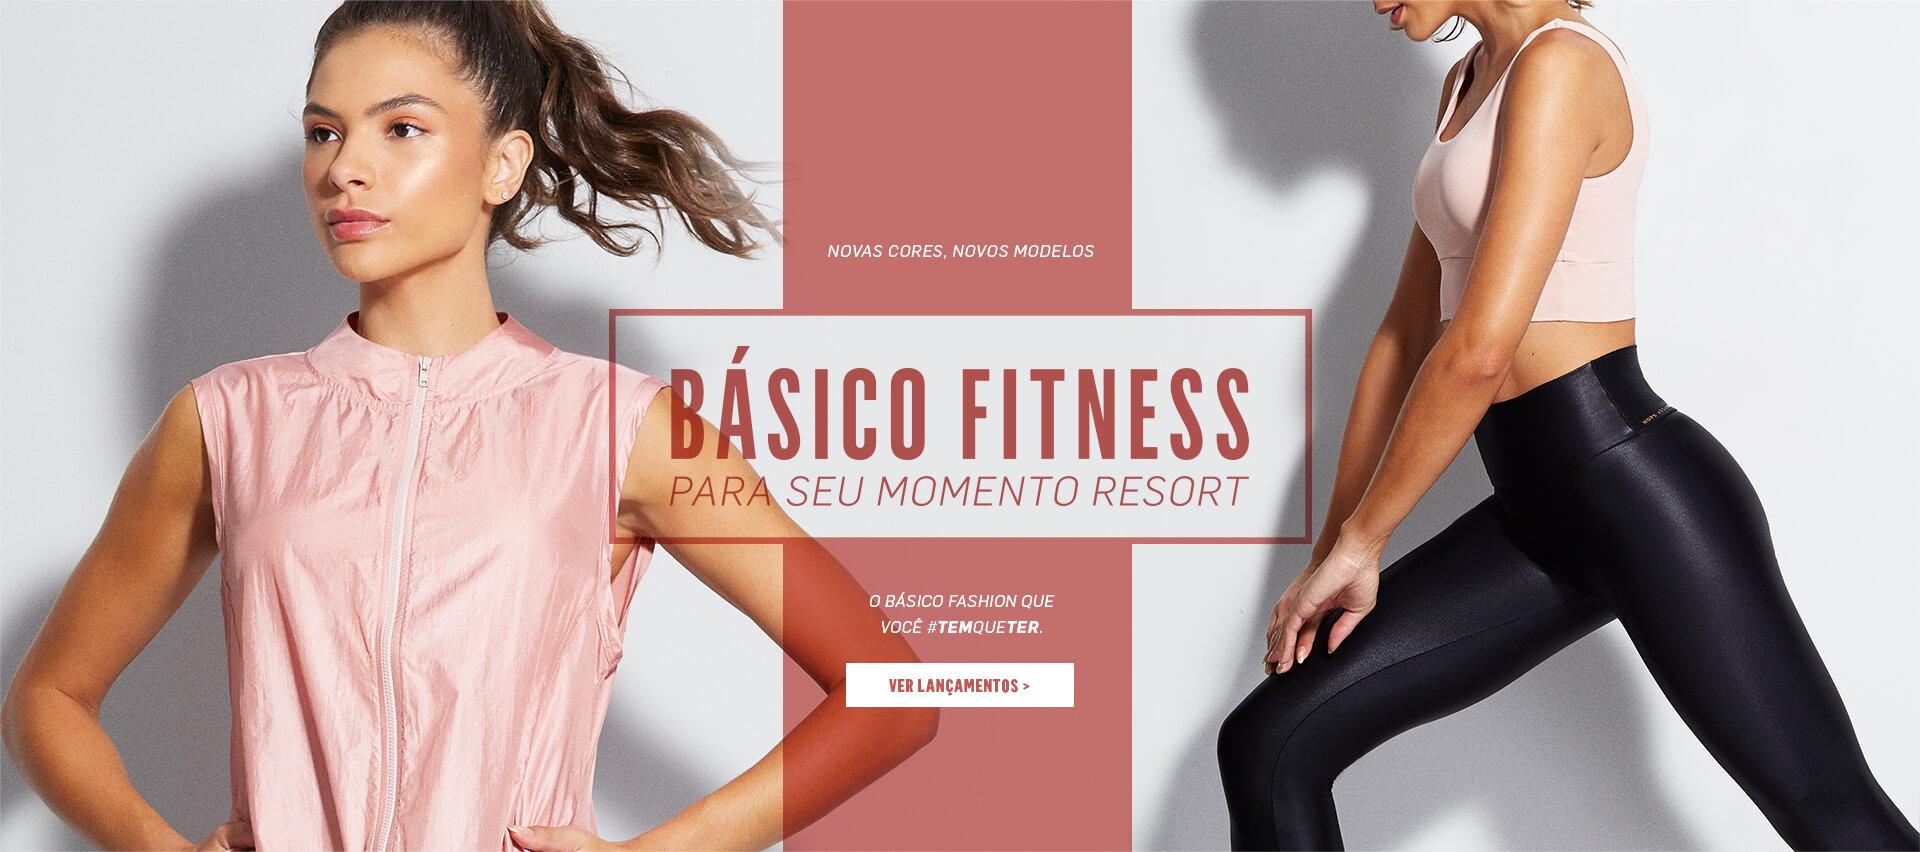 Básico Fitness